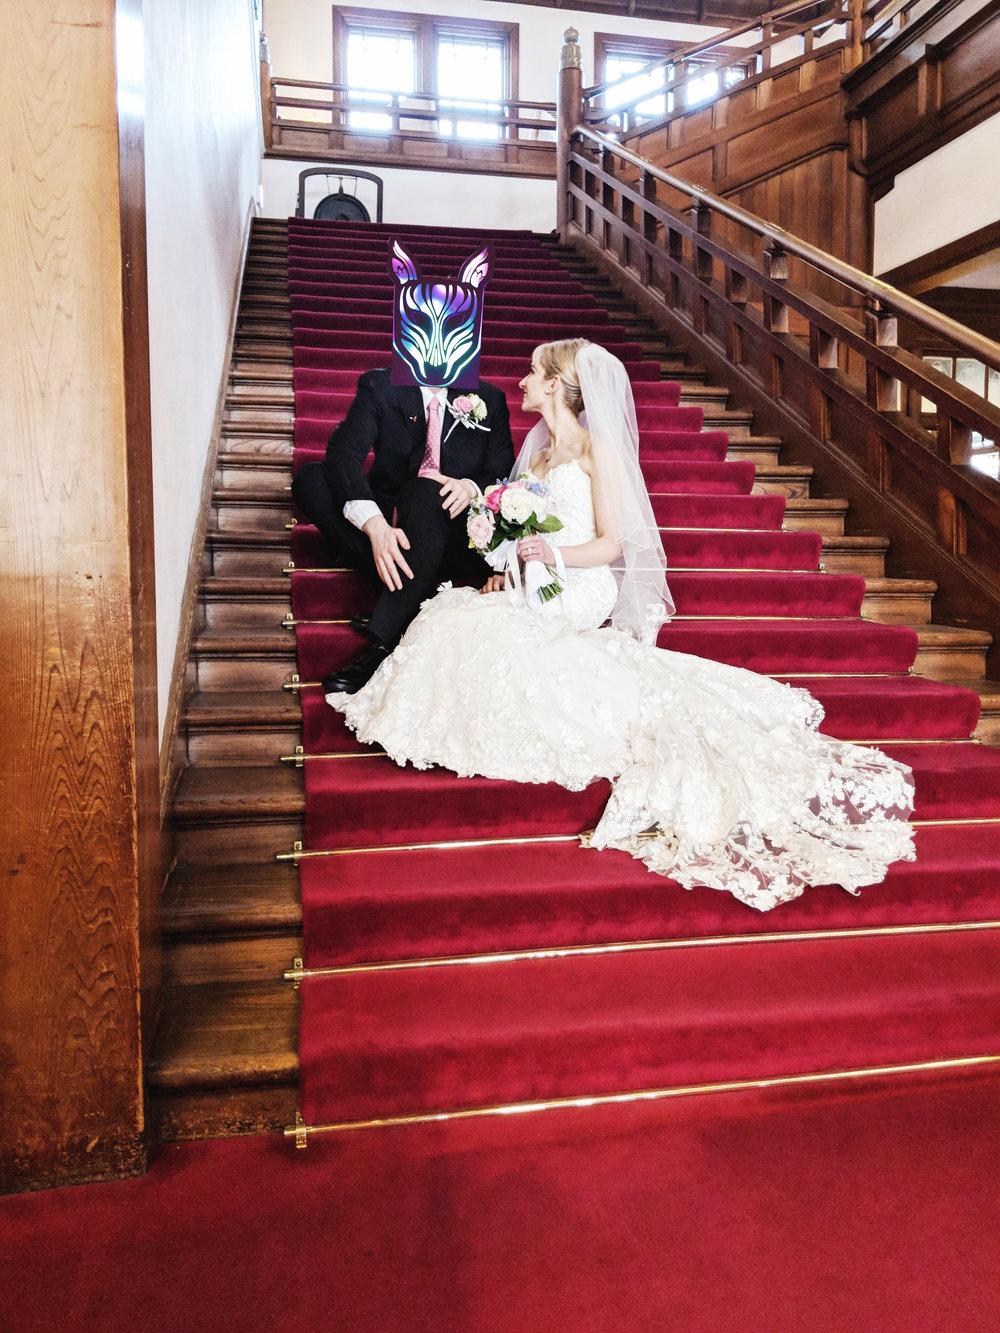 wedding stairs .JPG